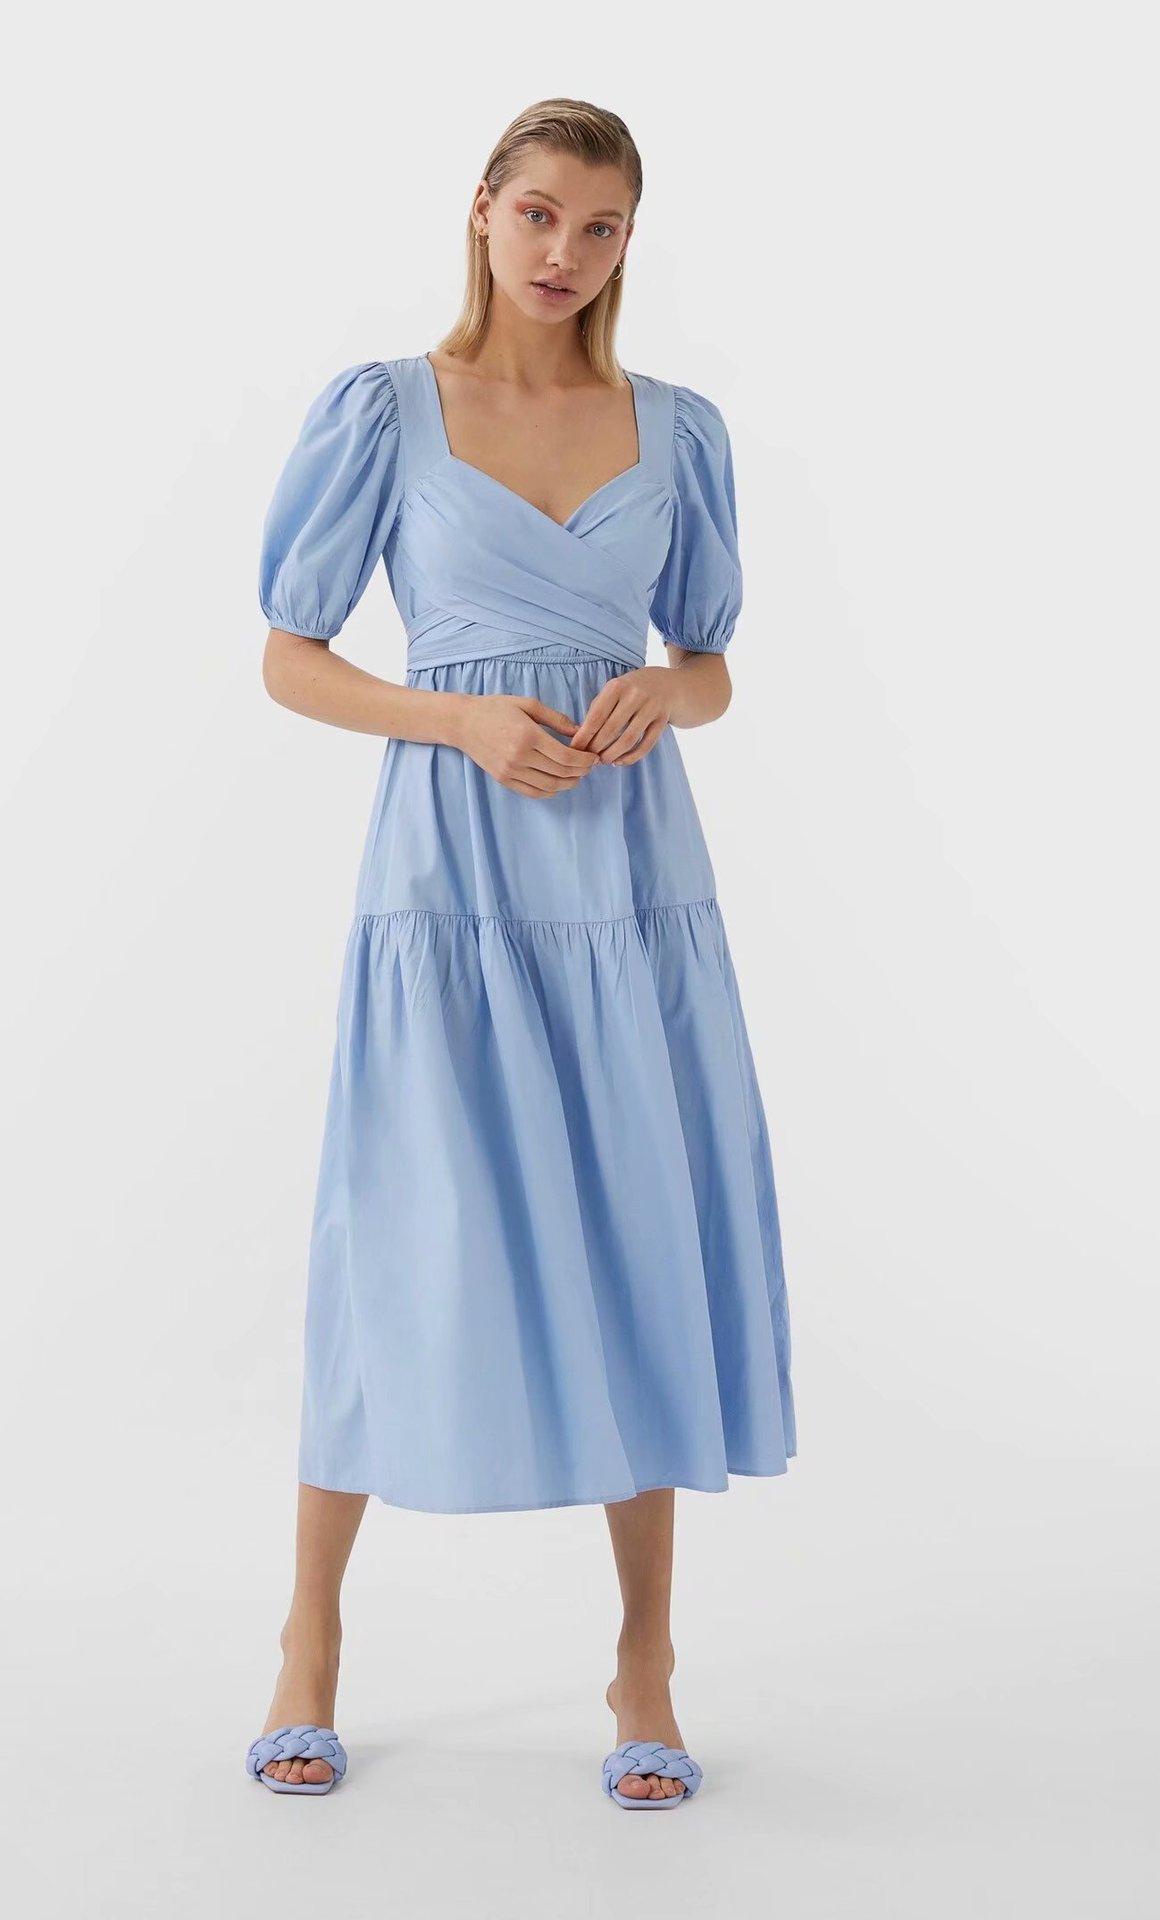 2020 New Spring Summer European V-neck Poplin Splicing Zaraing Women Dress Vadiming Sheining Female Blue Dress WEW63.72